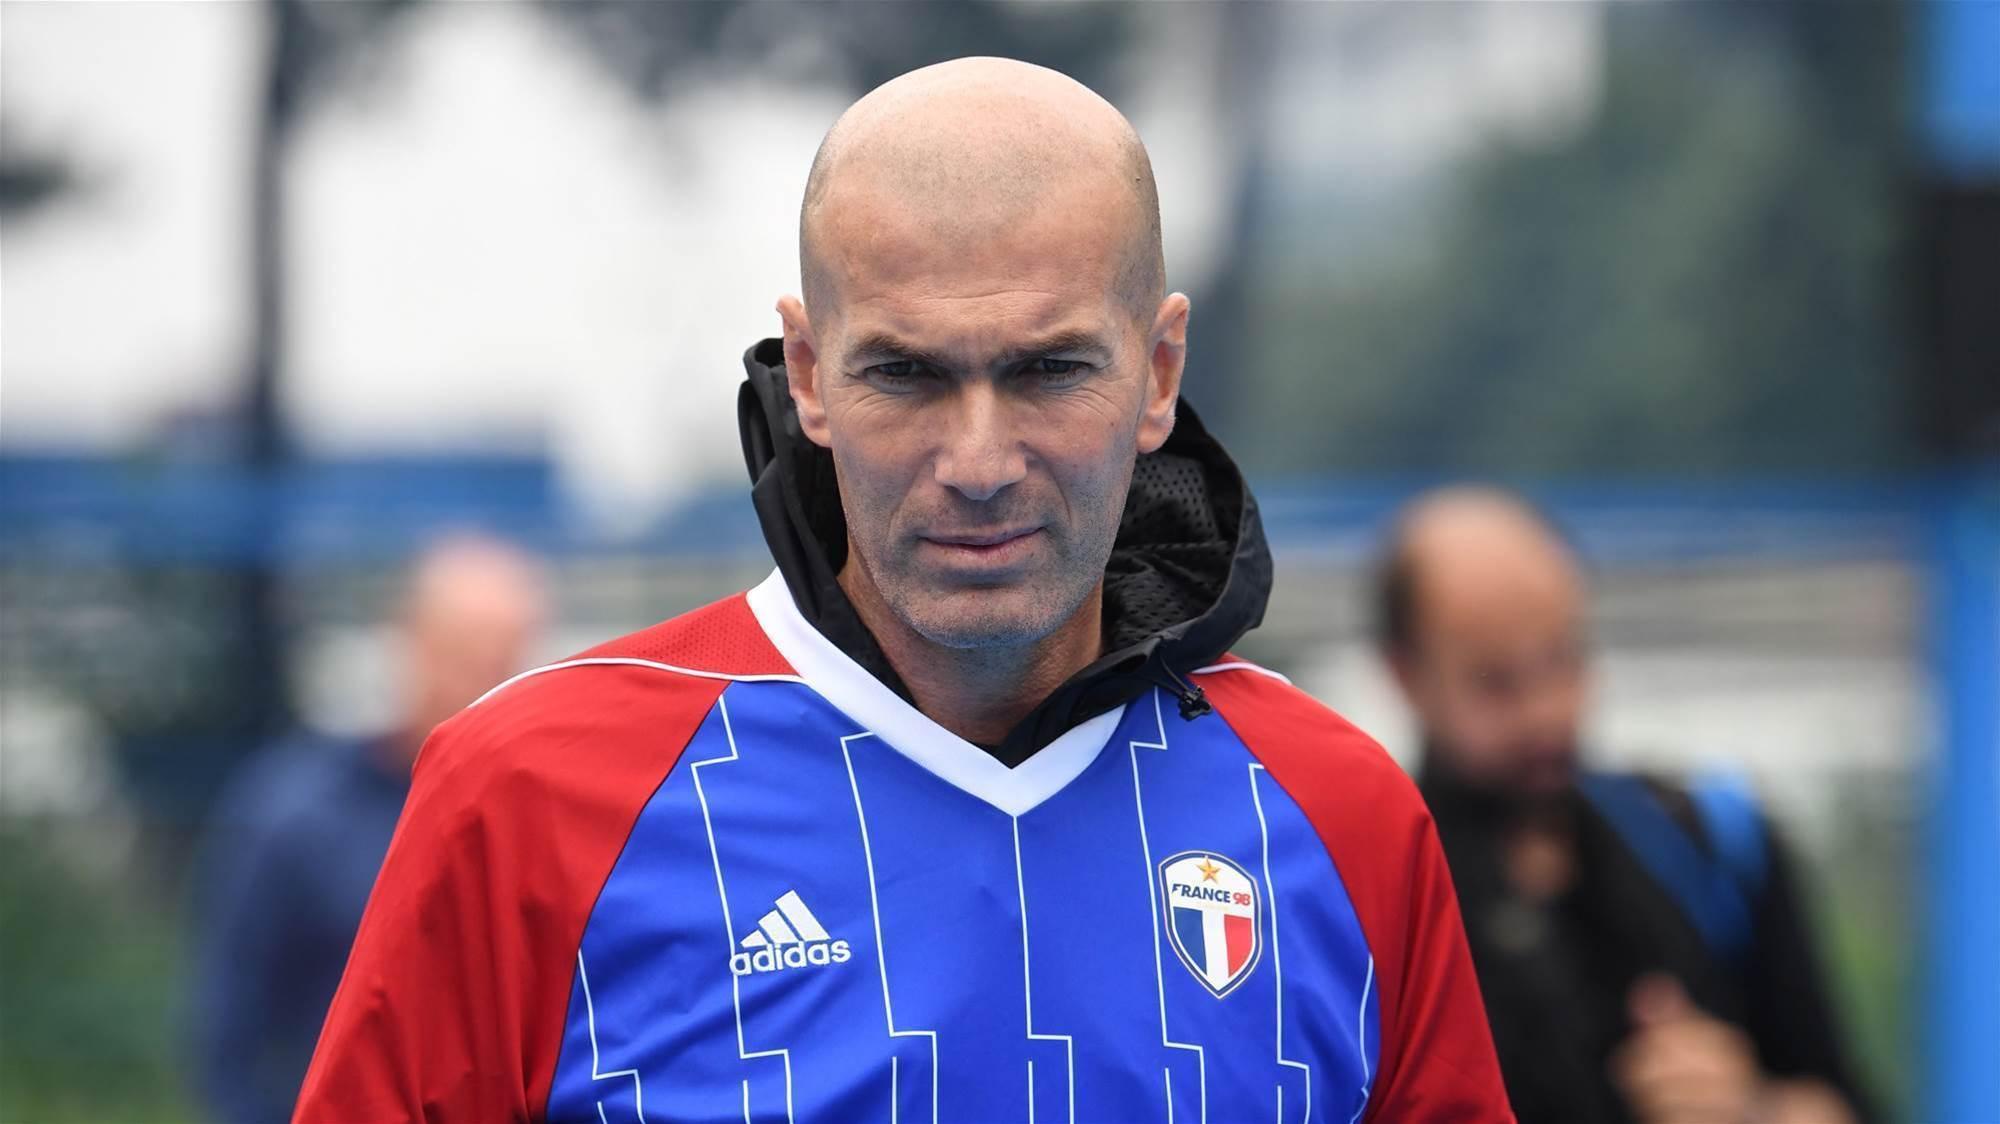 Zidane: I don't want the France job yet